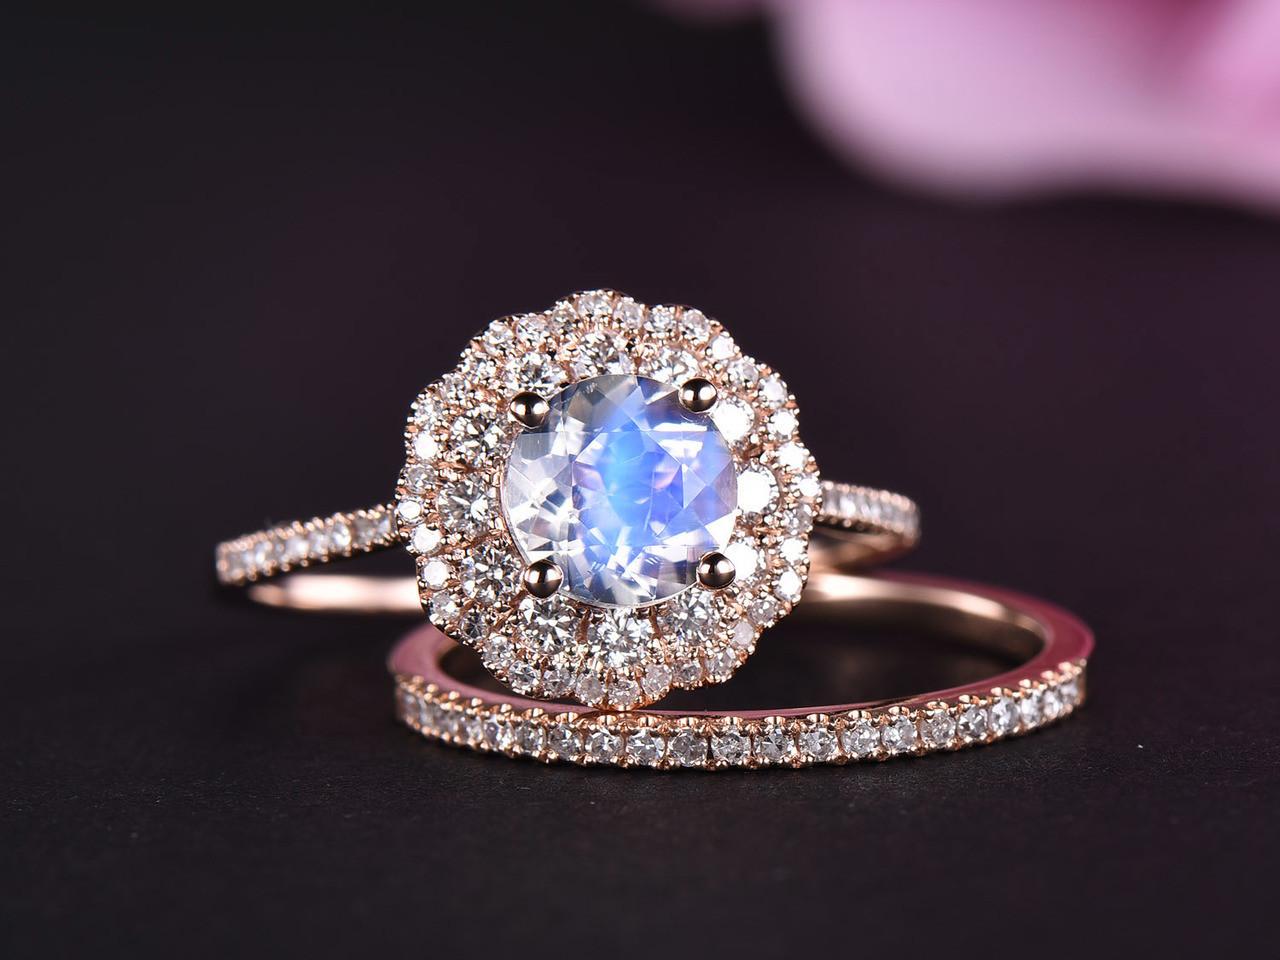 f0b80026162 Round Moonstone Engagement Ring Set Full Cut Diamond Wedding Band 14k Rose  Gold 6.5mm